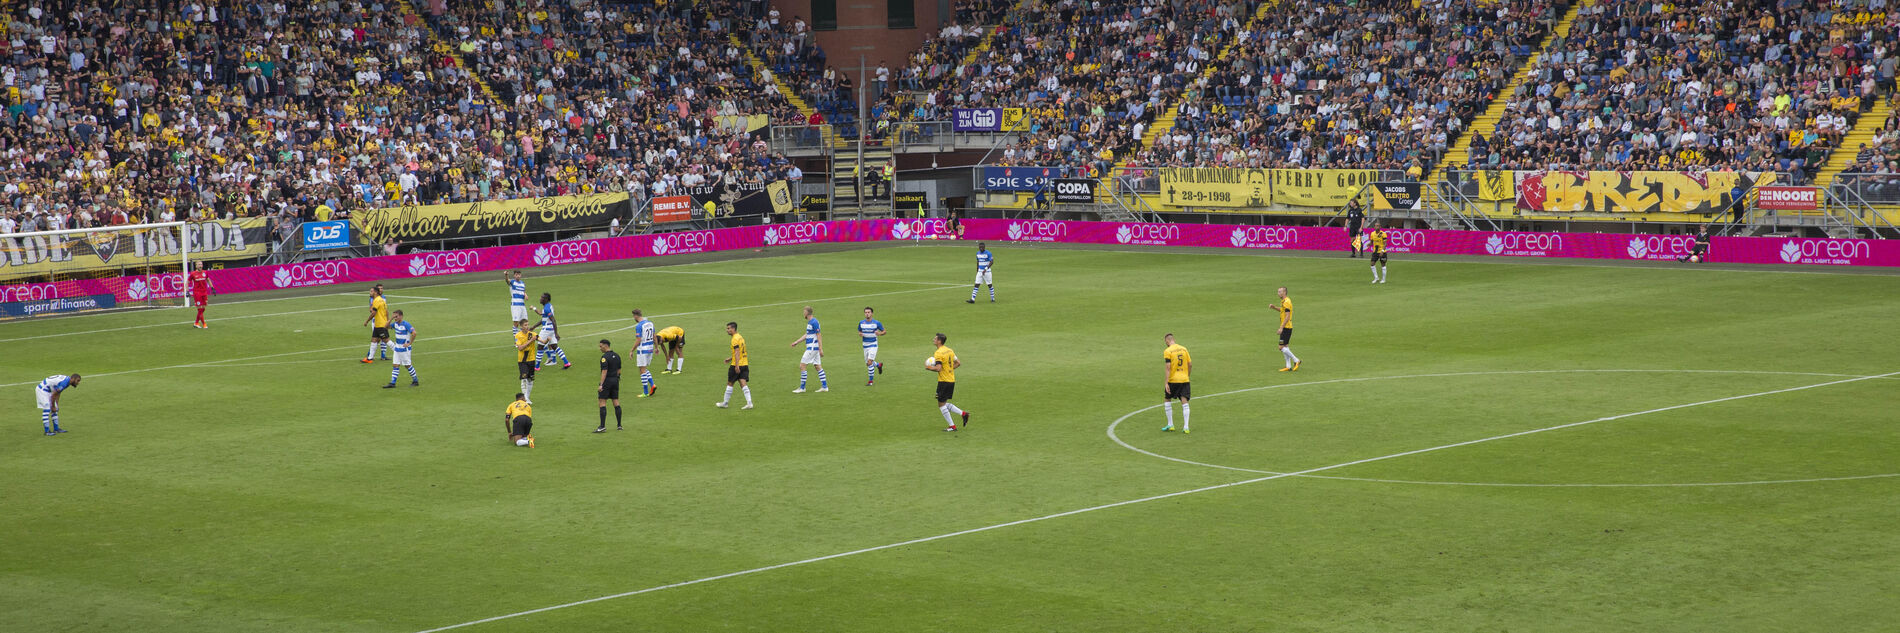 Oreon blijft NAC Breda supporten